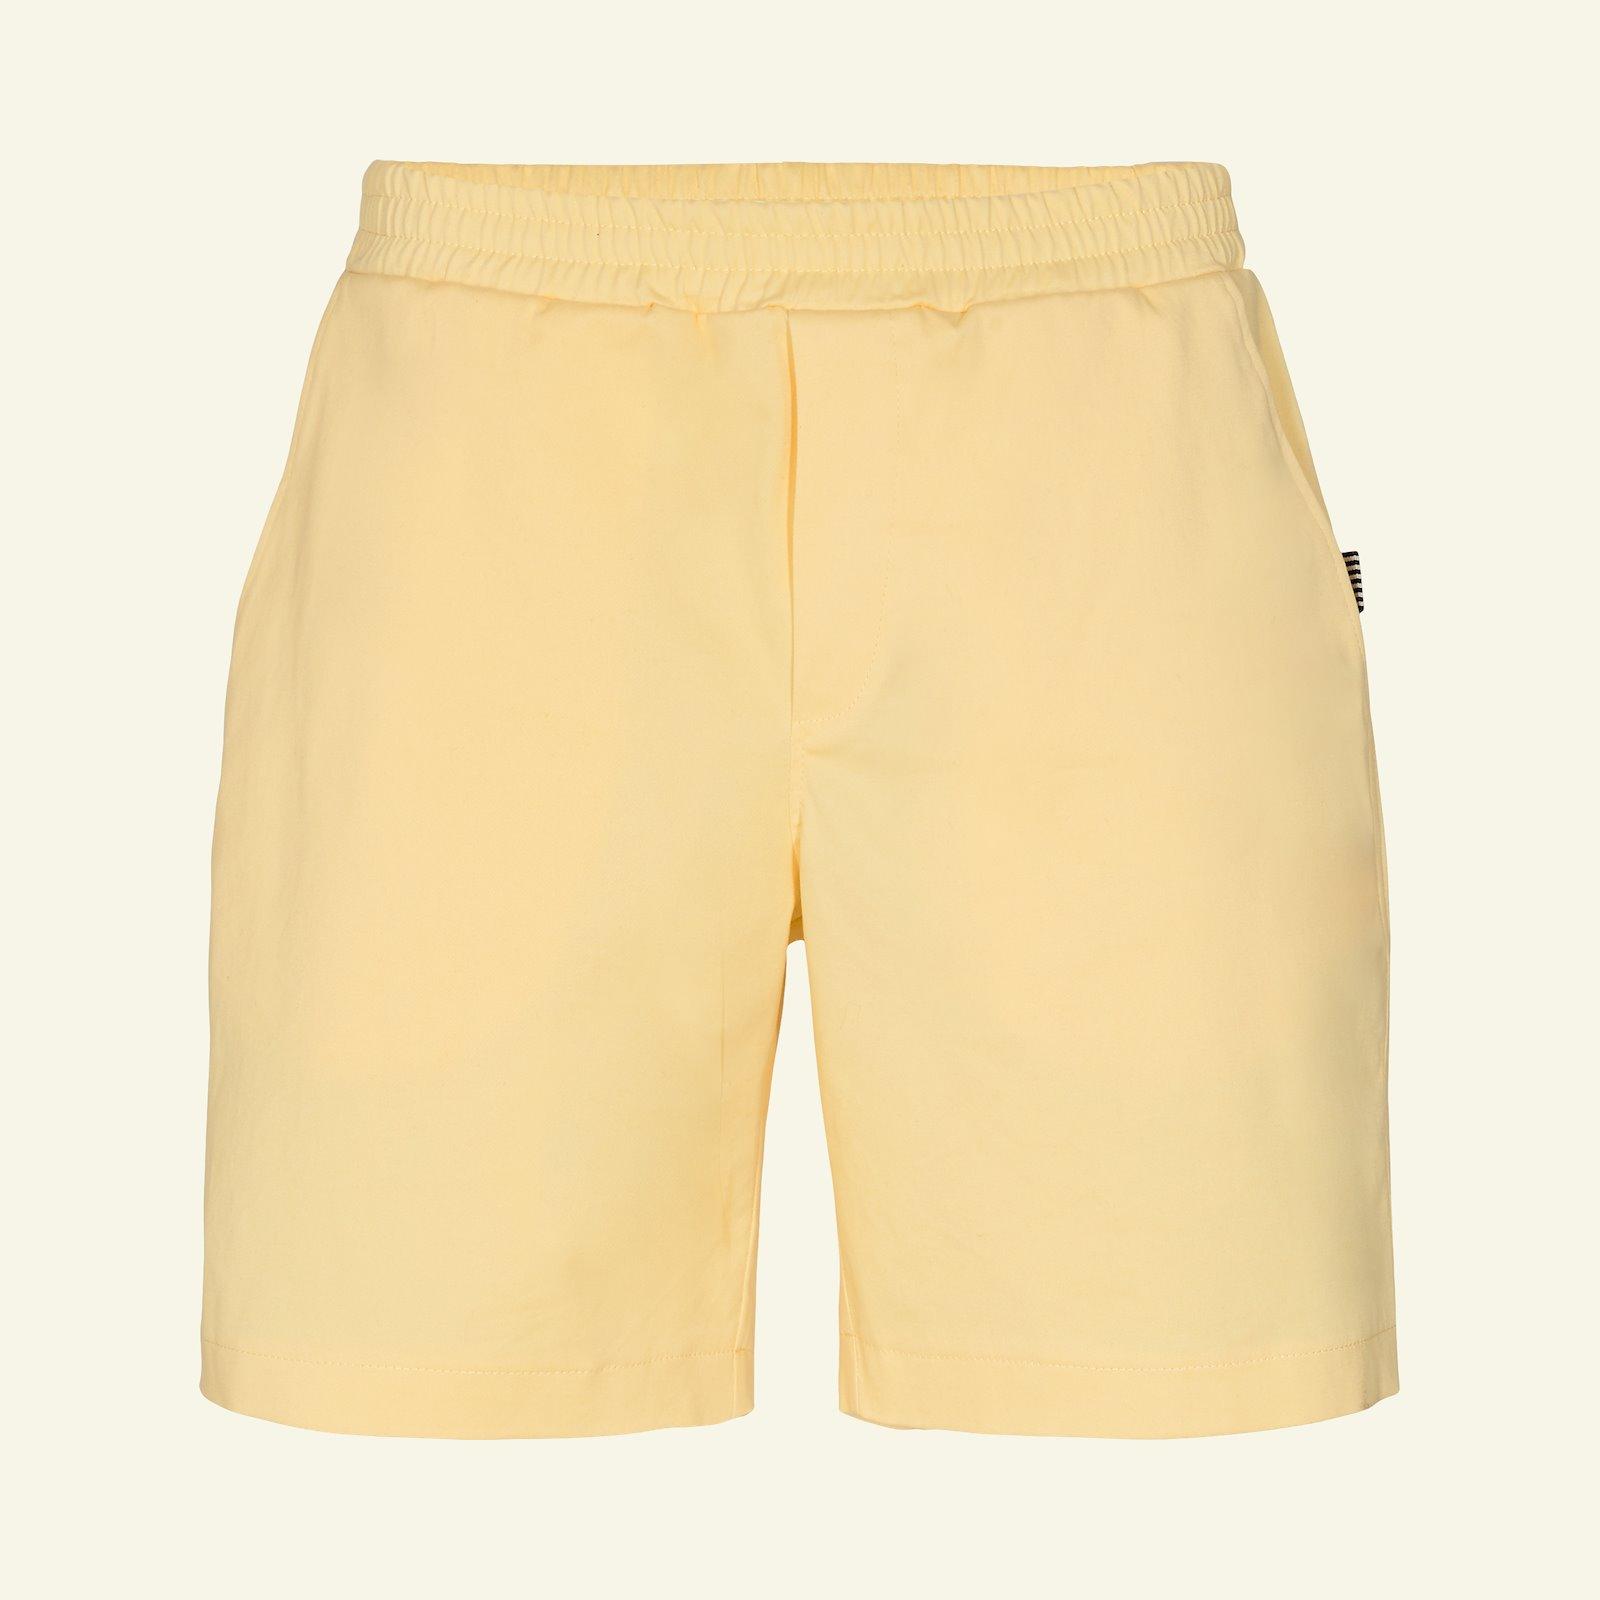 Shorts p85002_420416_3504001_21330_sskit